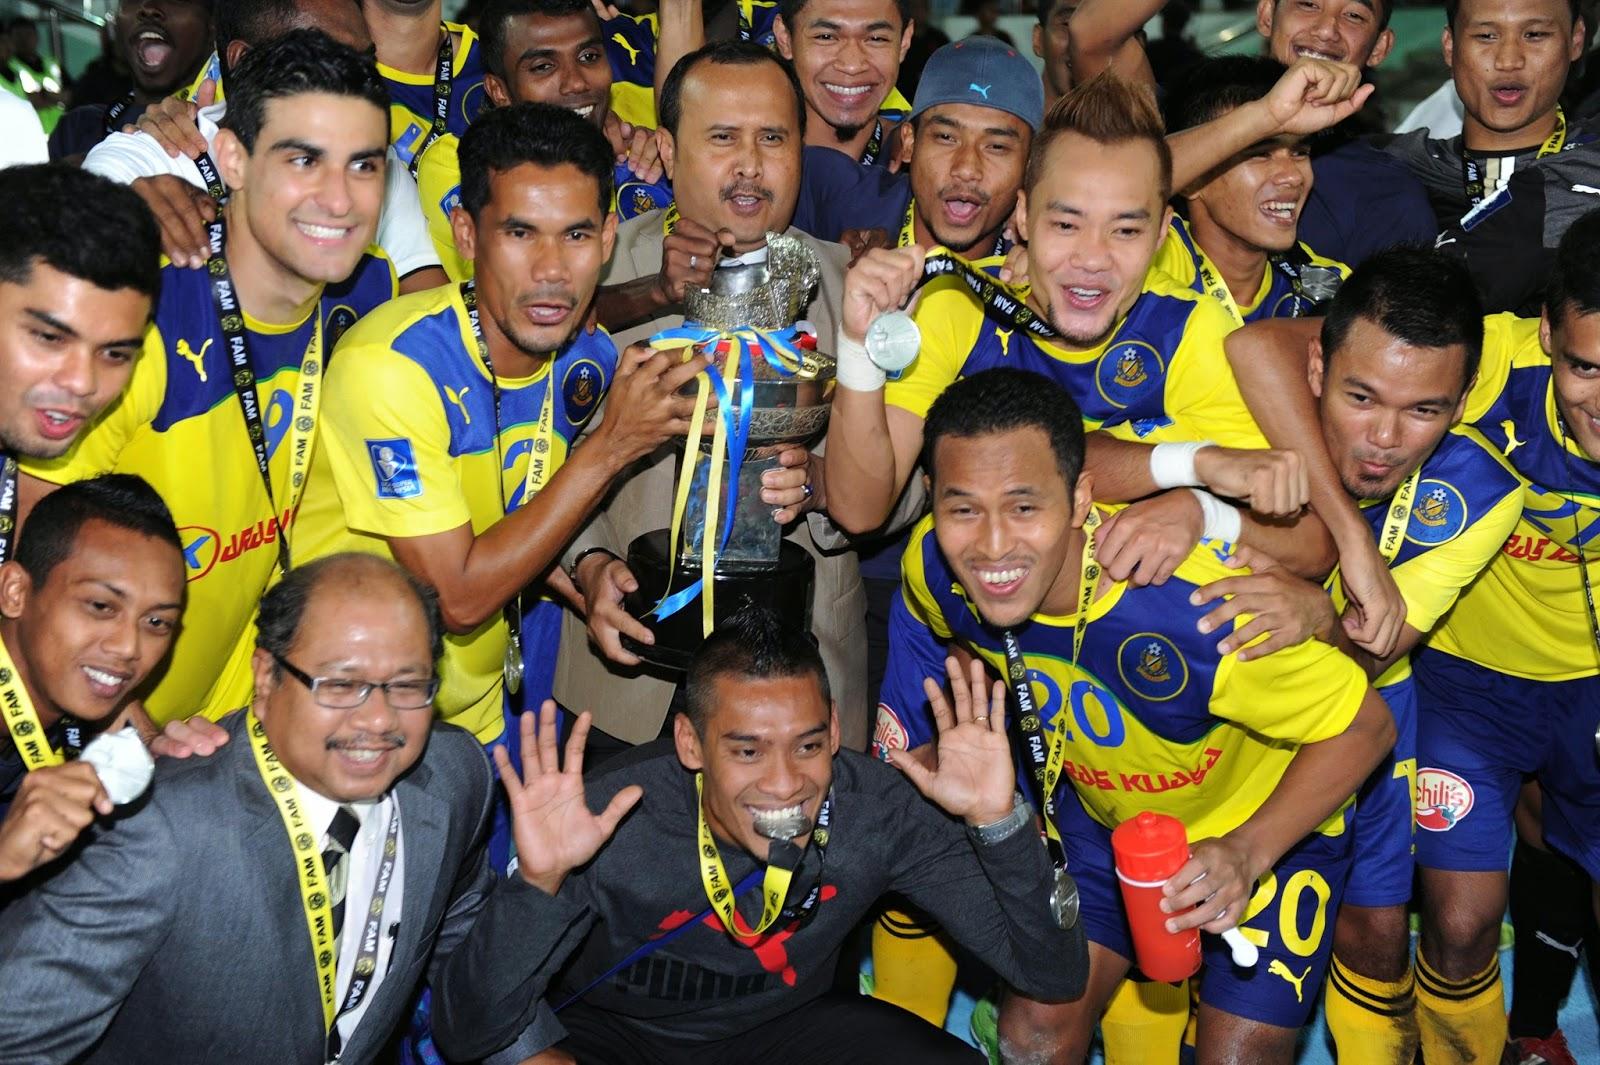 Pahang Juara Piala Sumbangsih 2014